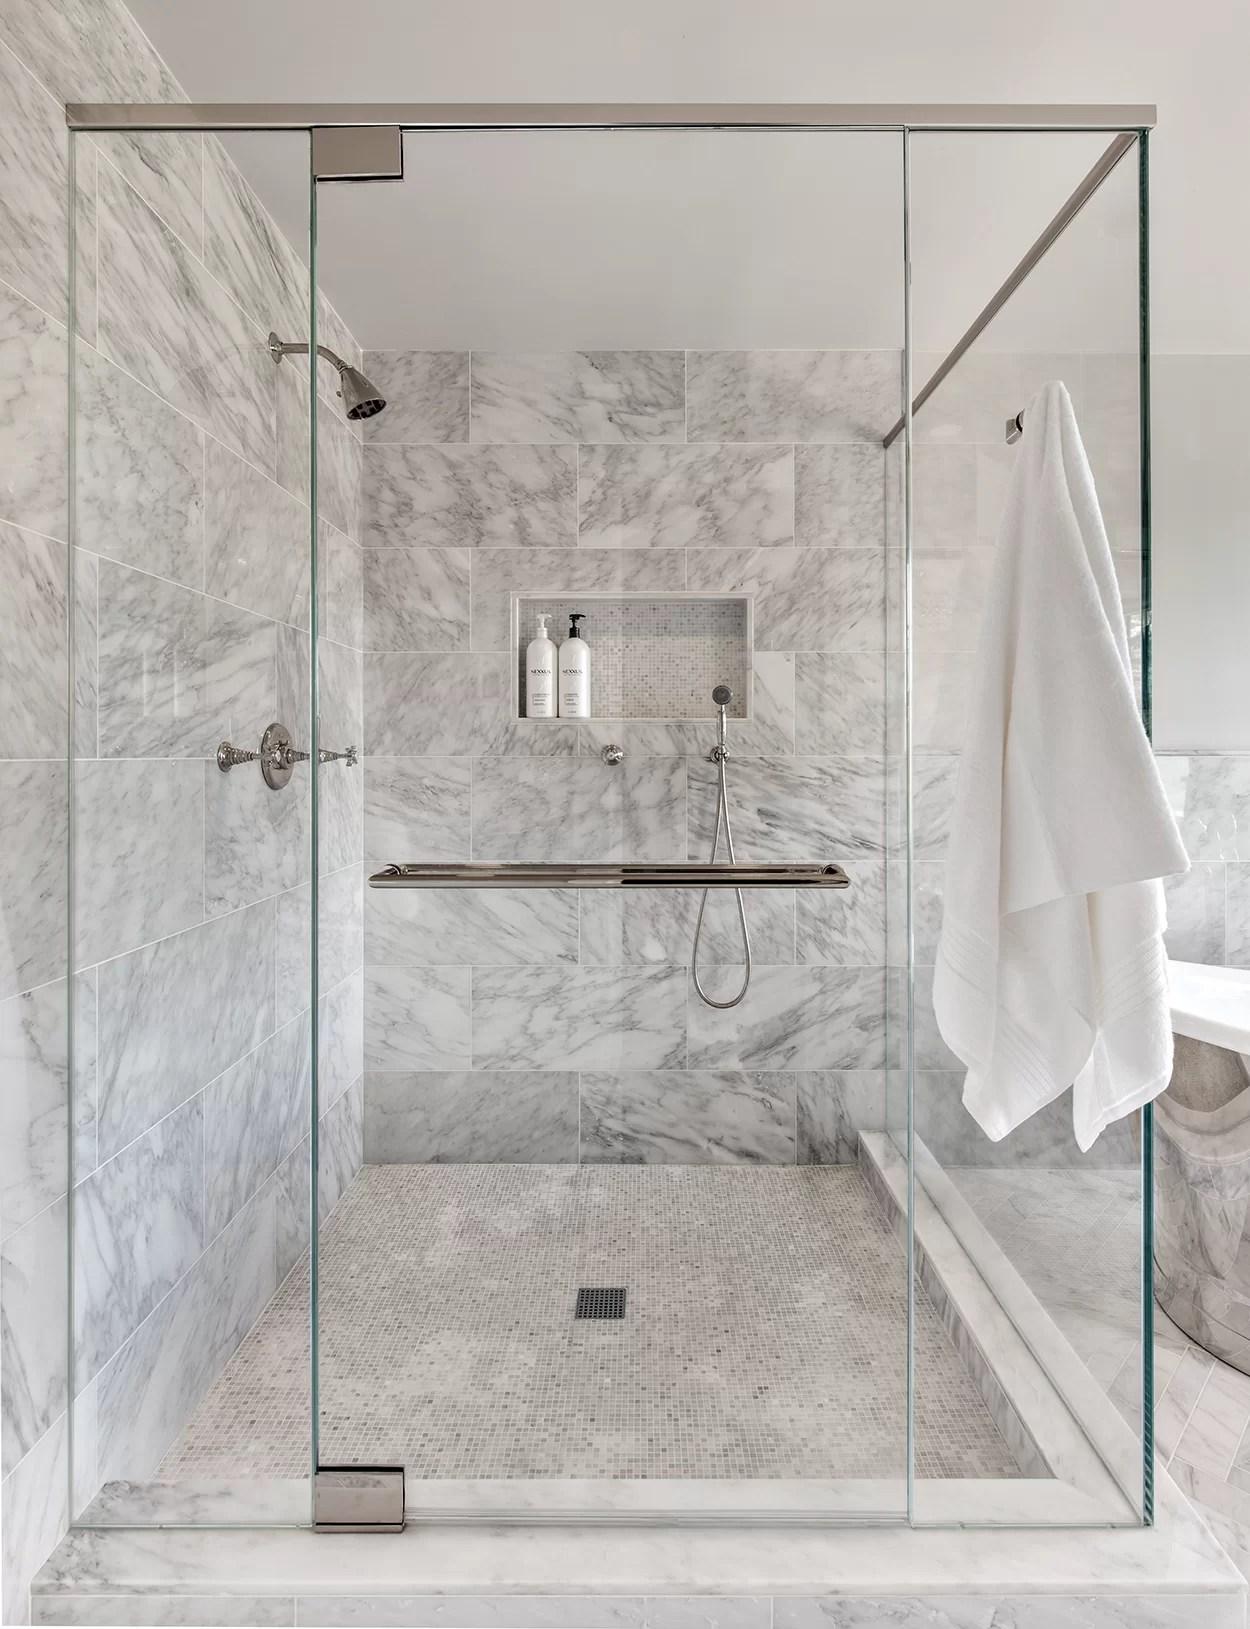 11 dazzling shower tile ideas for your shower renovation wayfair